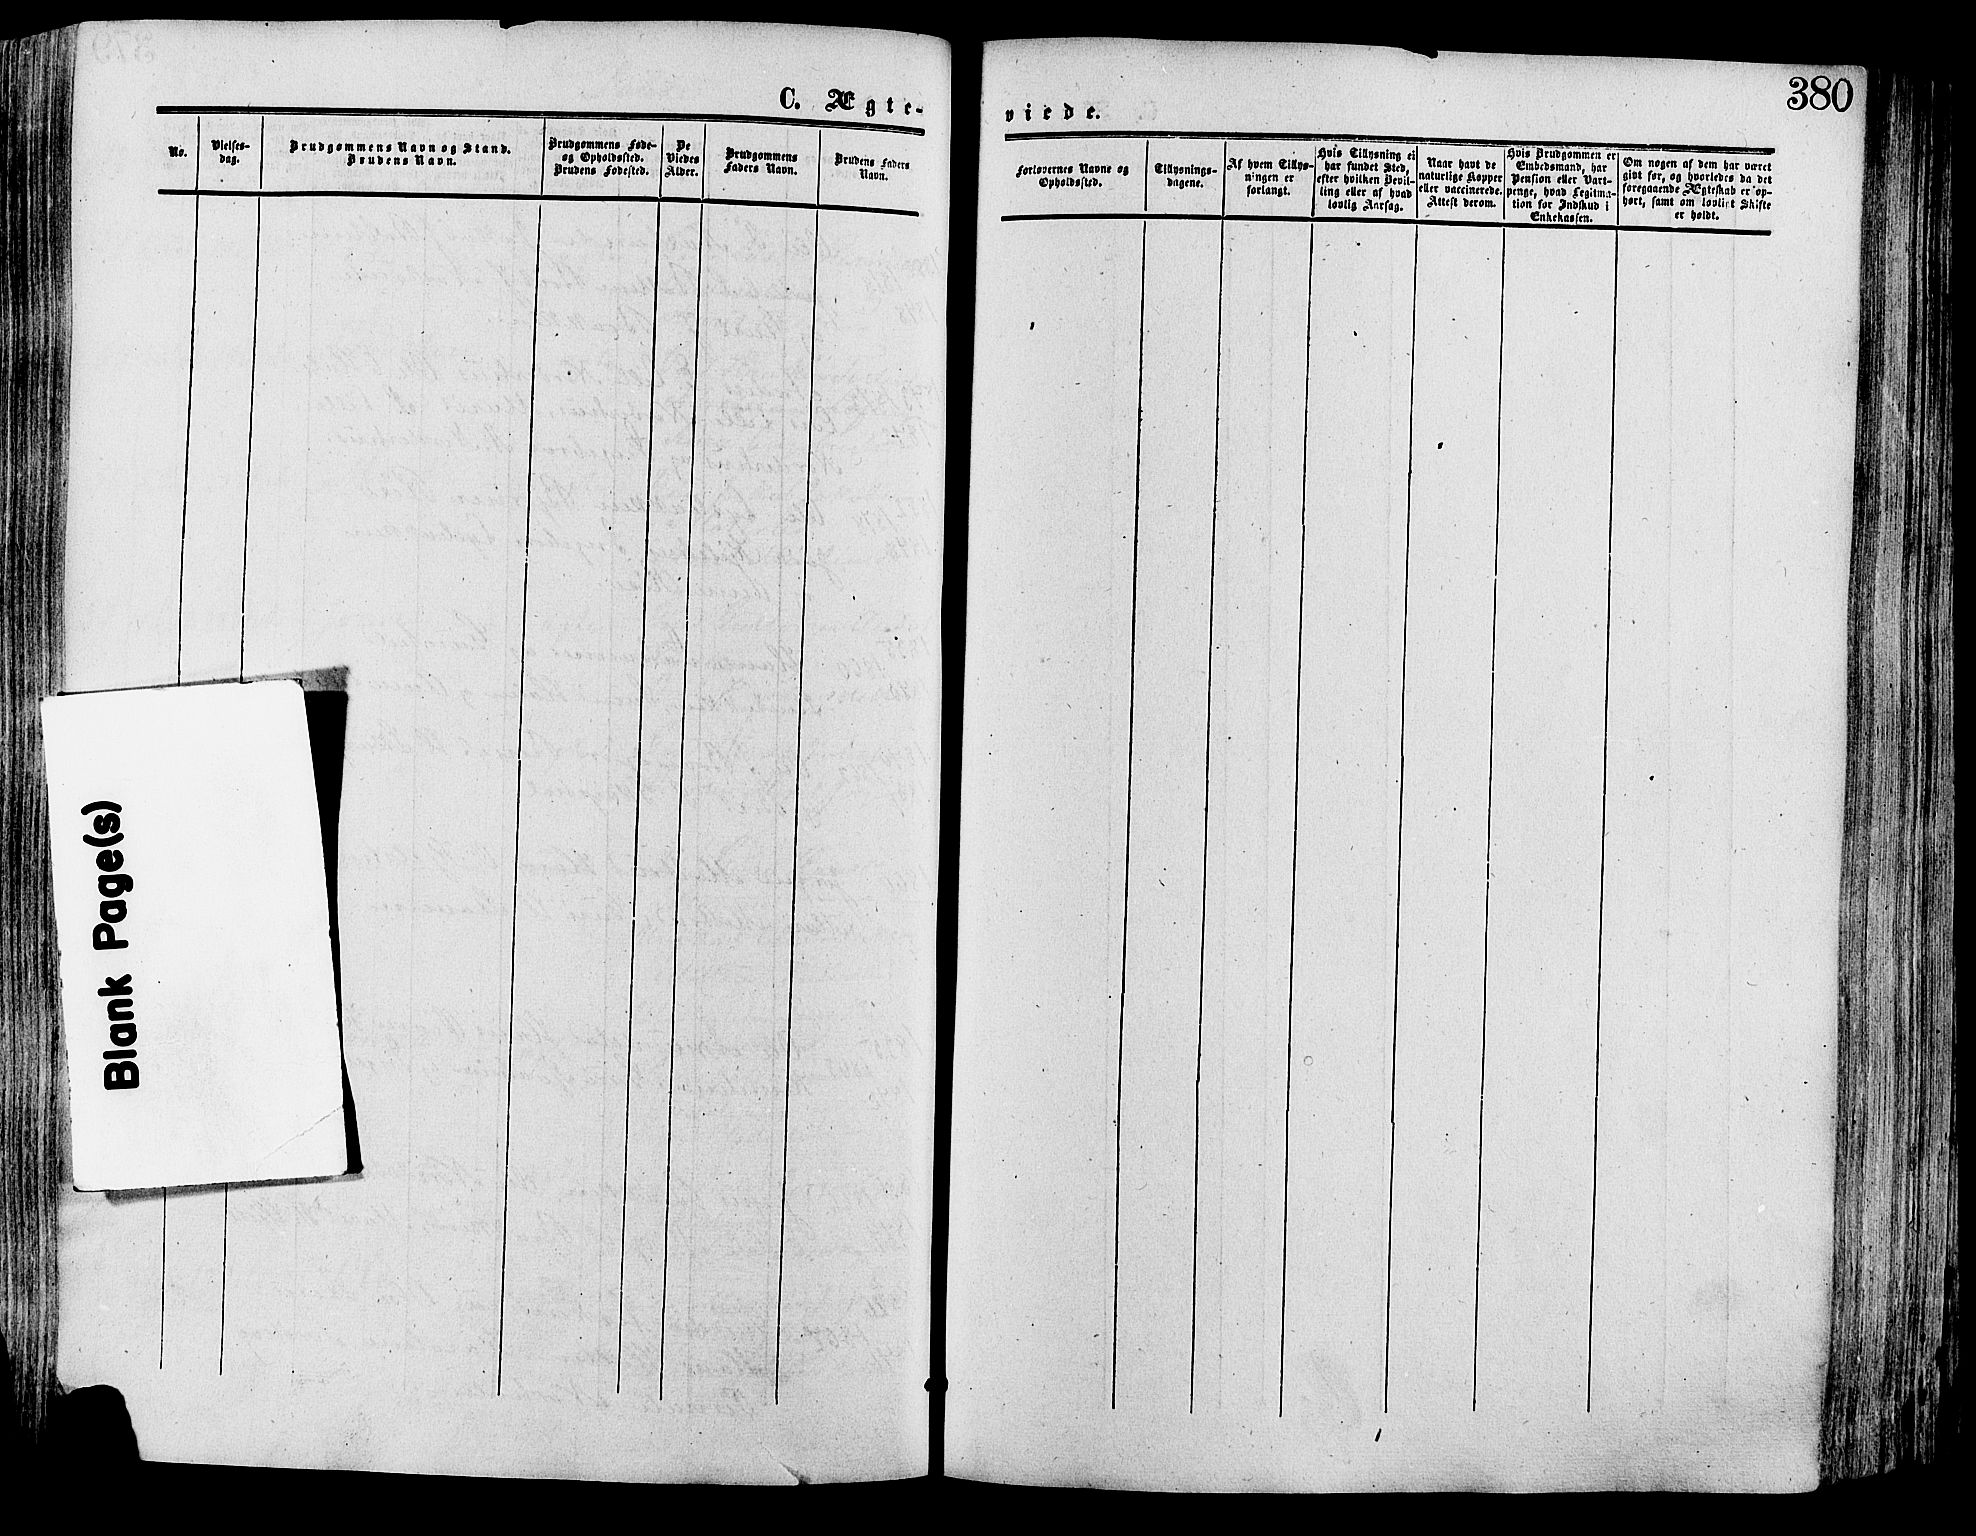 SAH, Lesja prestekontor, Ministerialbok nr. 8, 1854-1880, s. 380